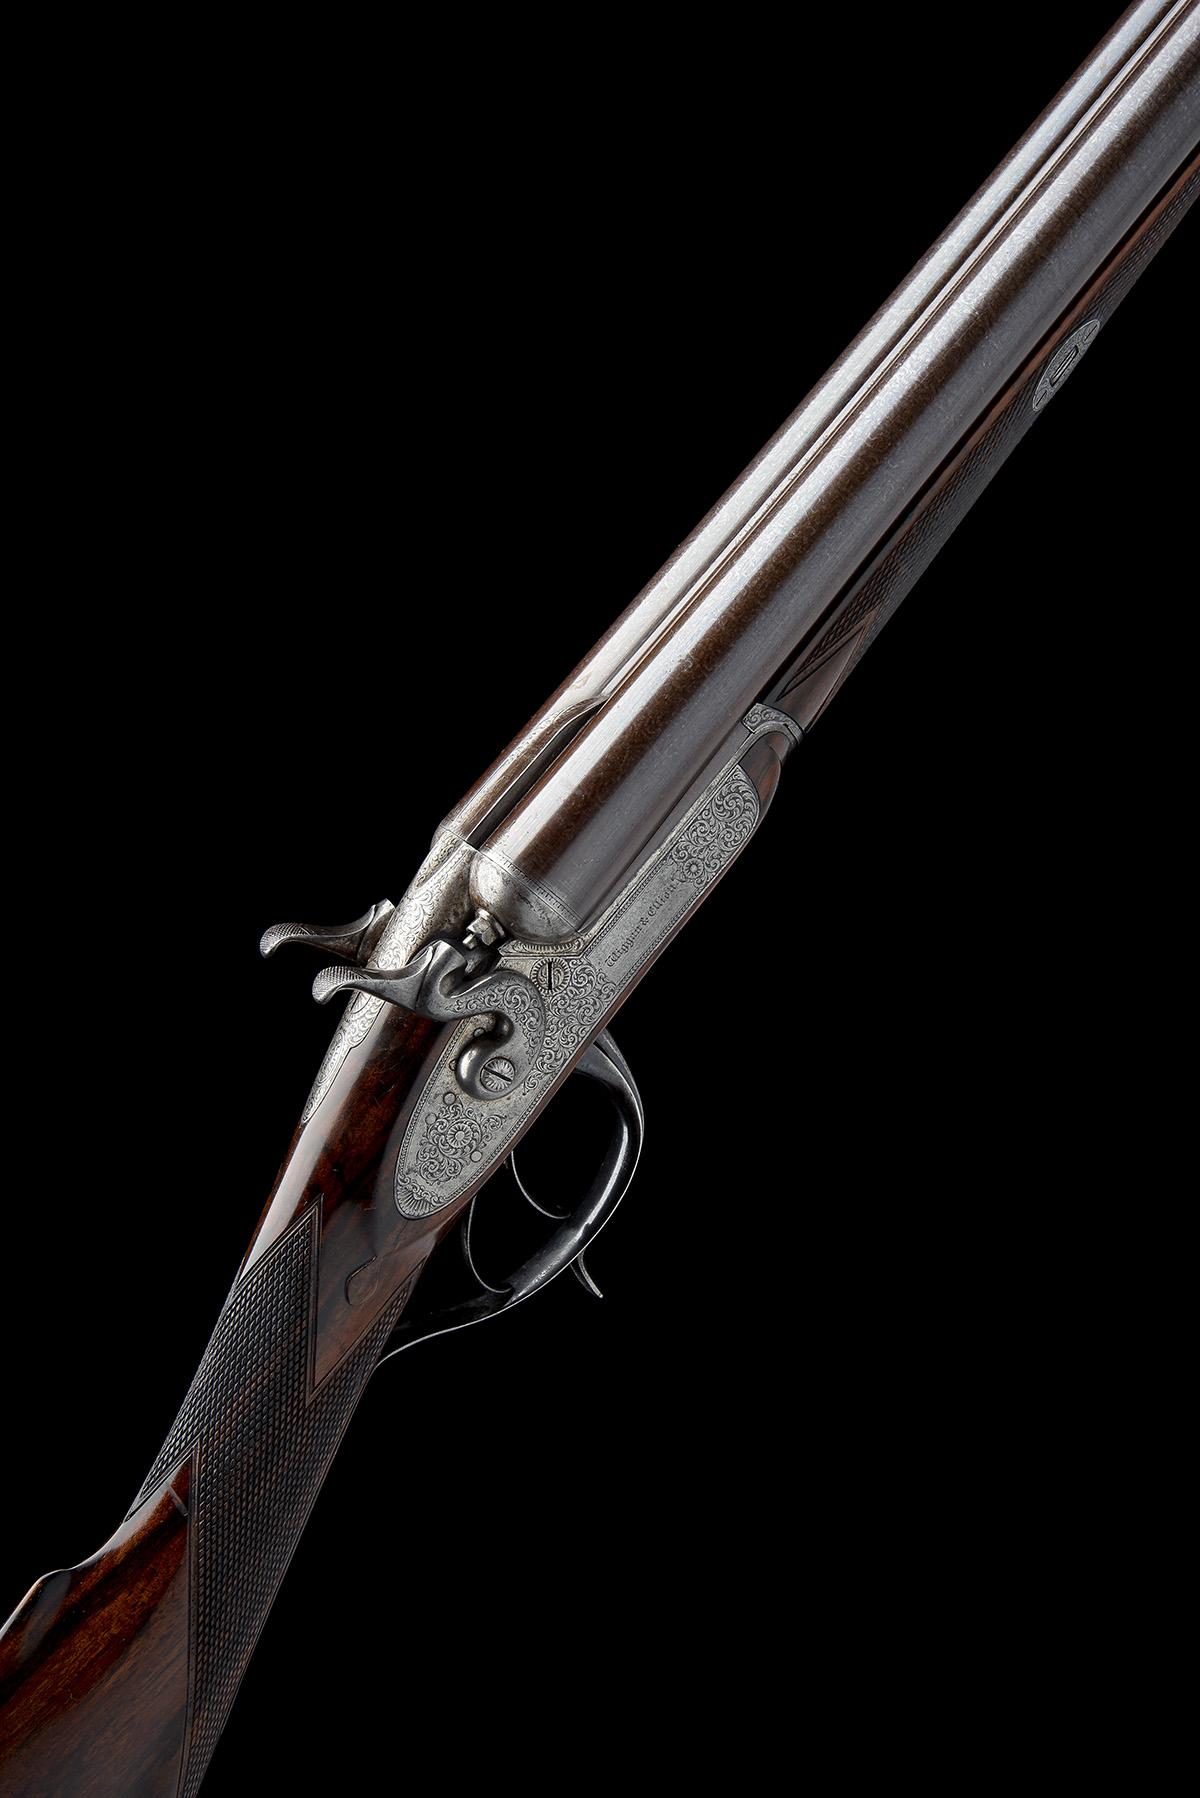 WIGGAN & ELLIOTT A SCARCE 12-BORE HENRY ELLIOTT 1863 PATENT PUSH-FORWARD UNDERLEVER ROTATING